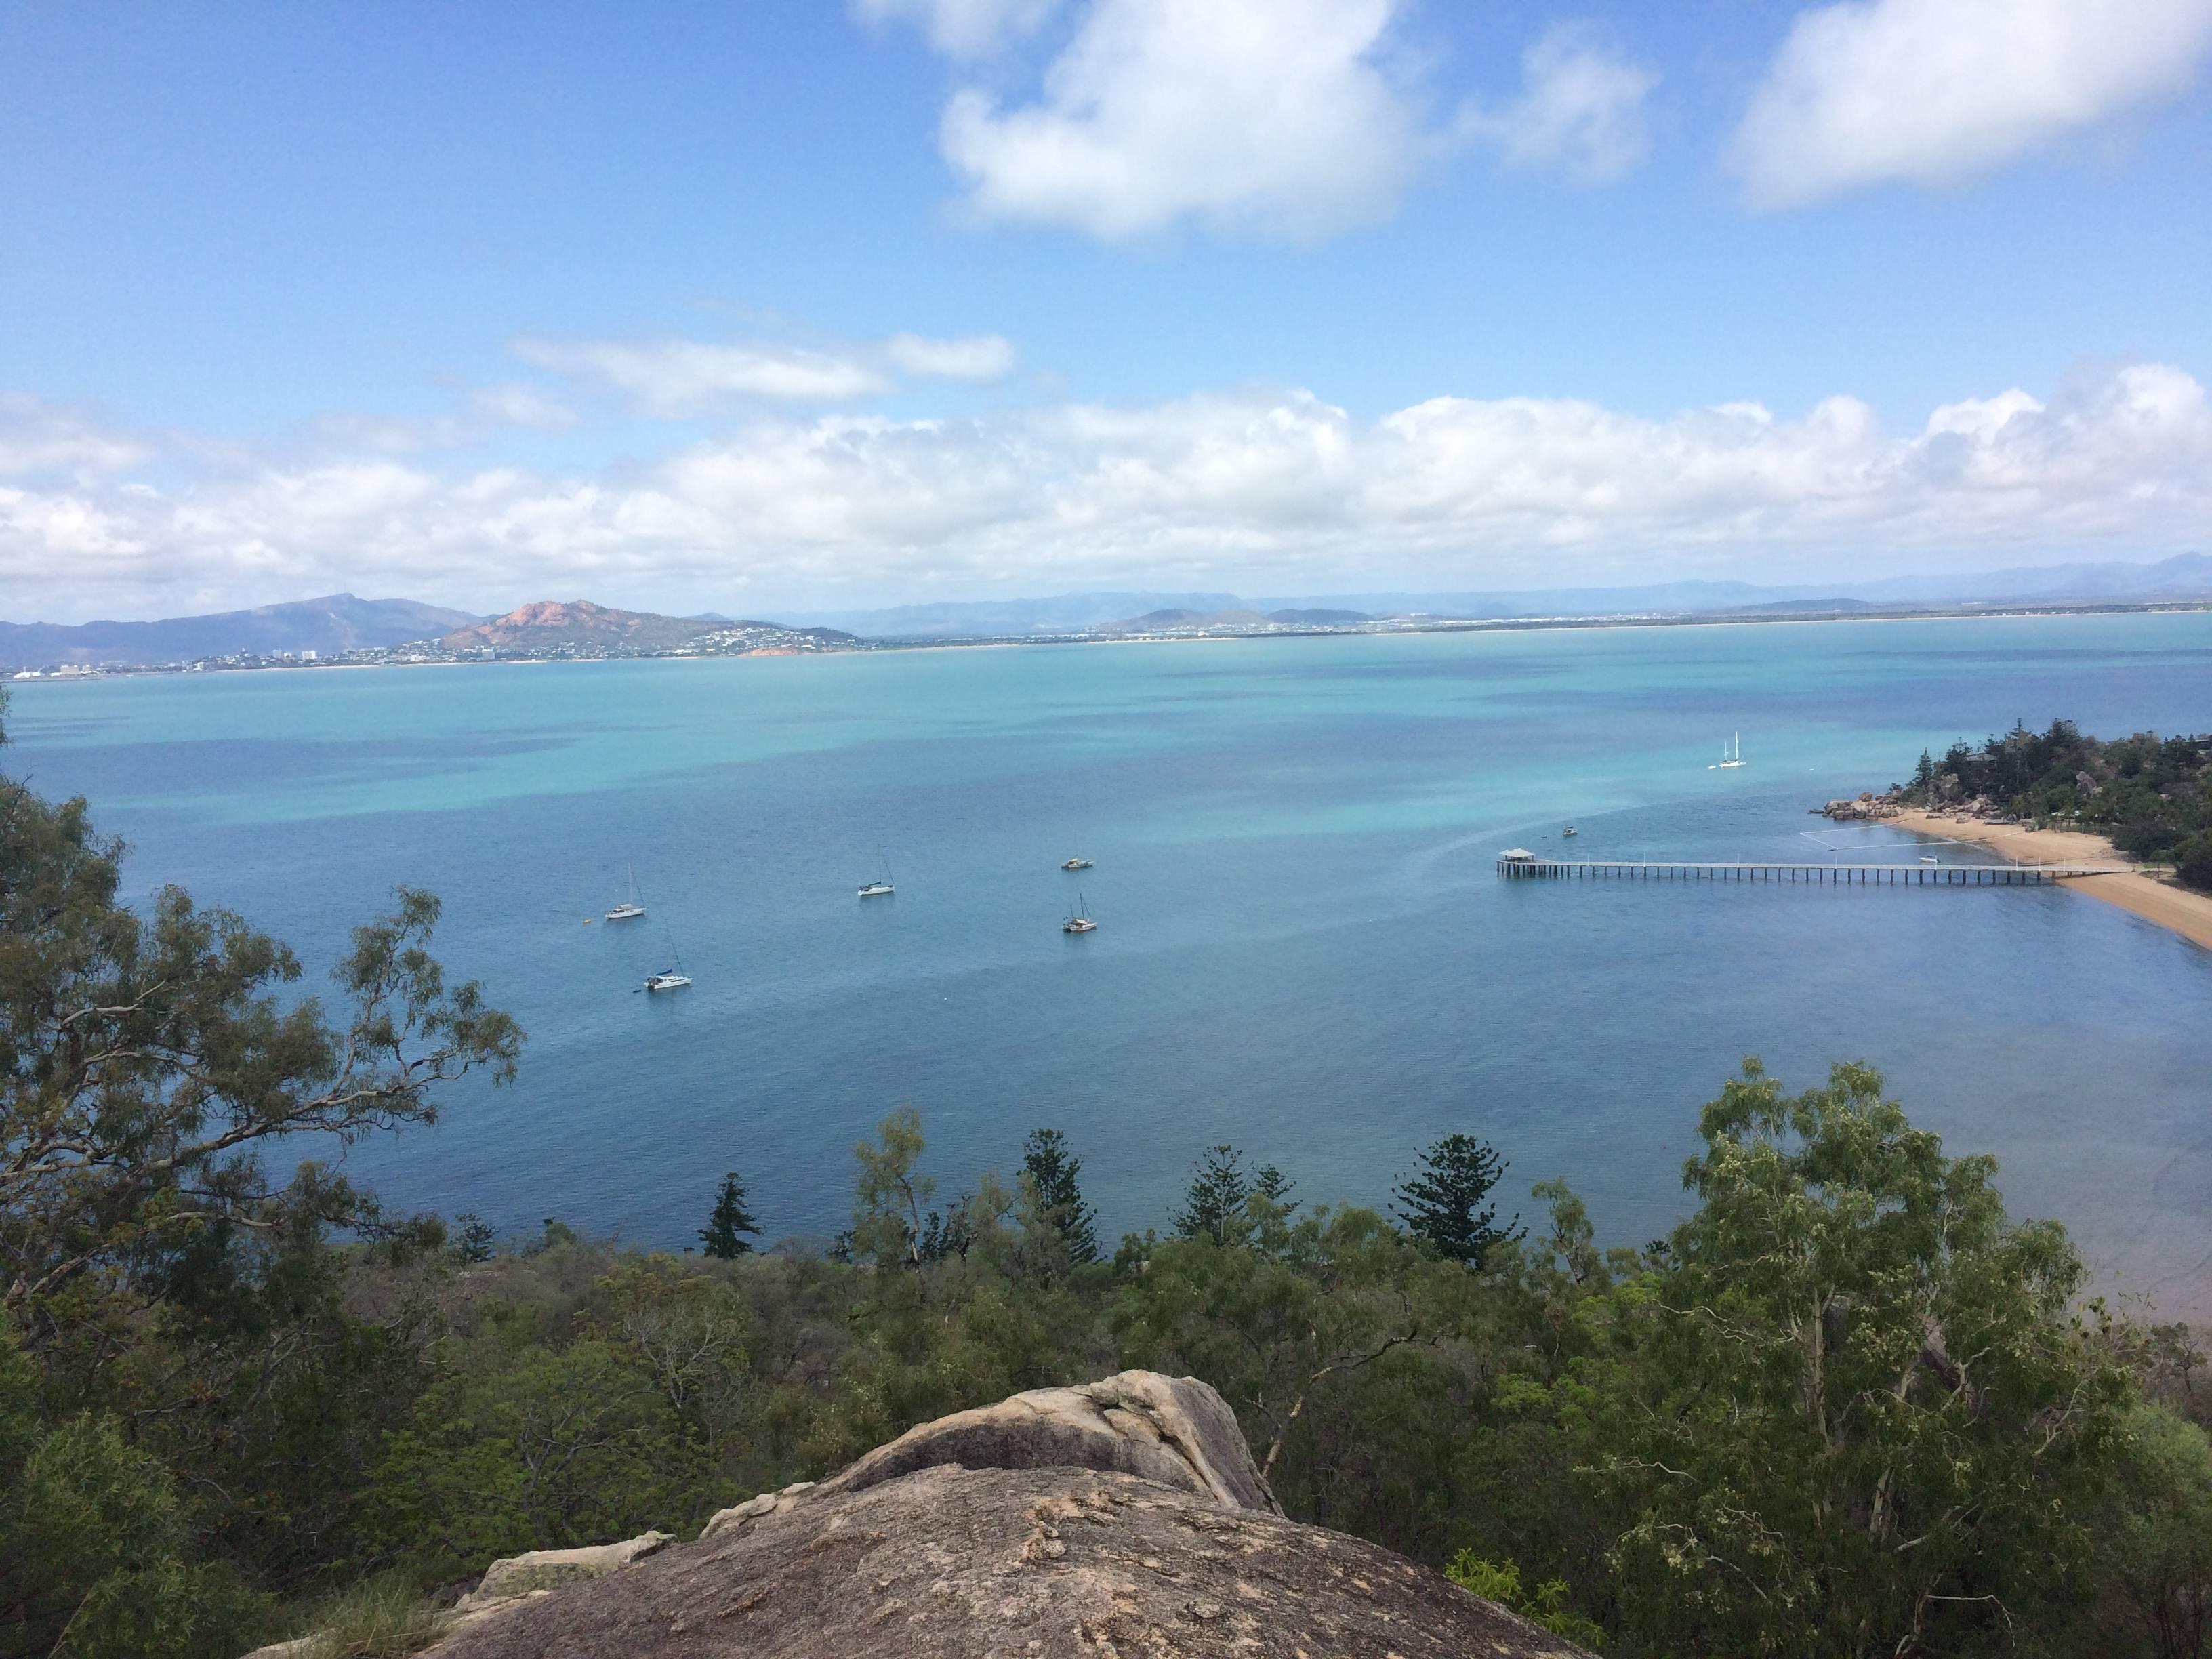 Photo 1: Magnetic Island, queensland, australie